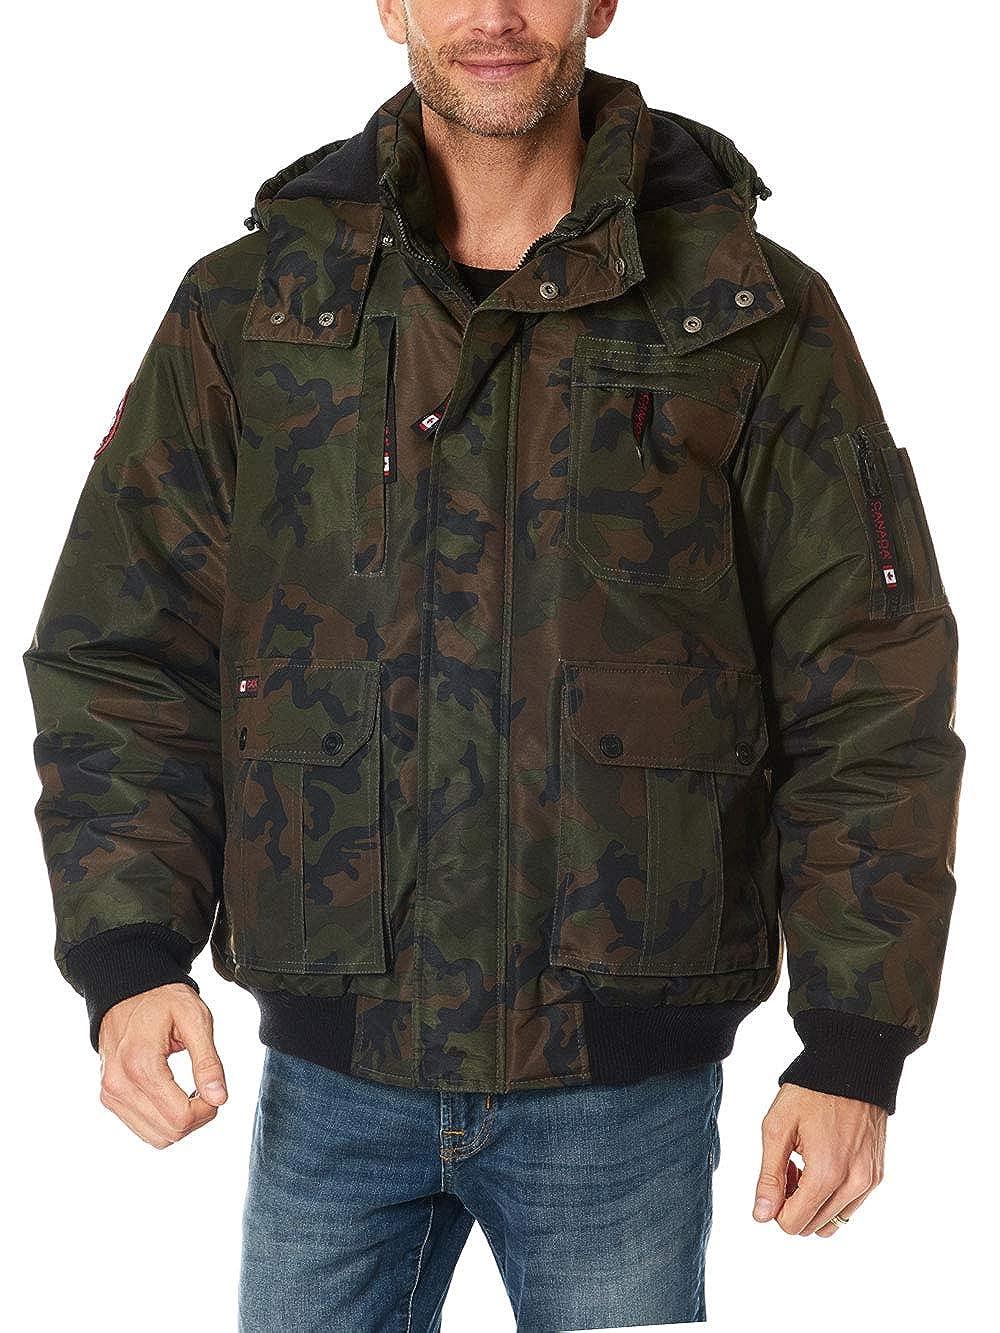 CANADA WEATHER GEAR Boys Insulated Jacket